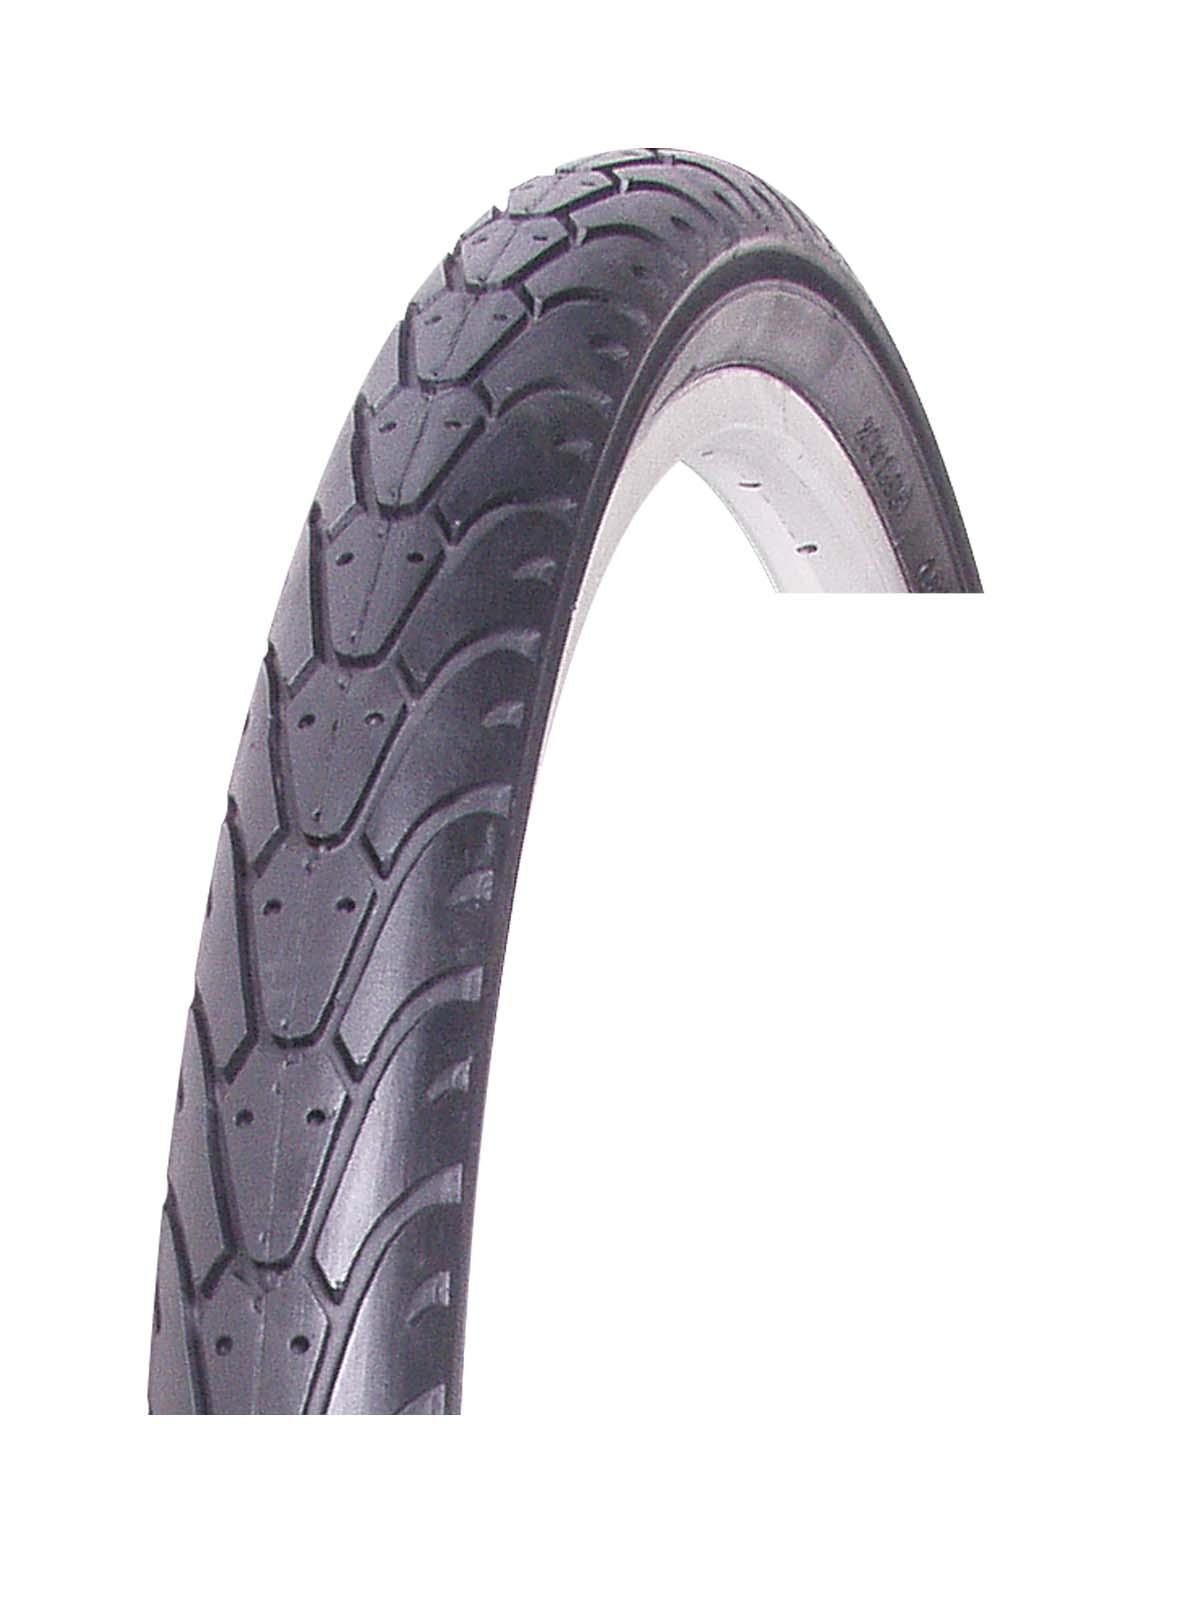 VEE RUBBER - Външна гума Vee Rubber 20x1,75 VRB212